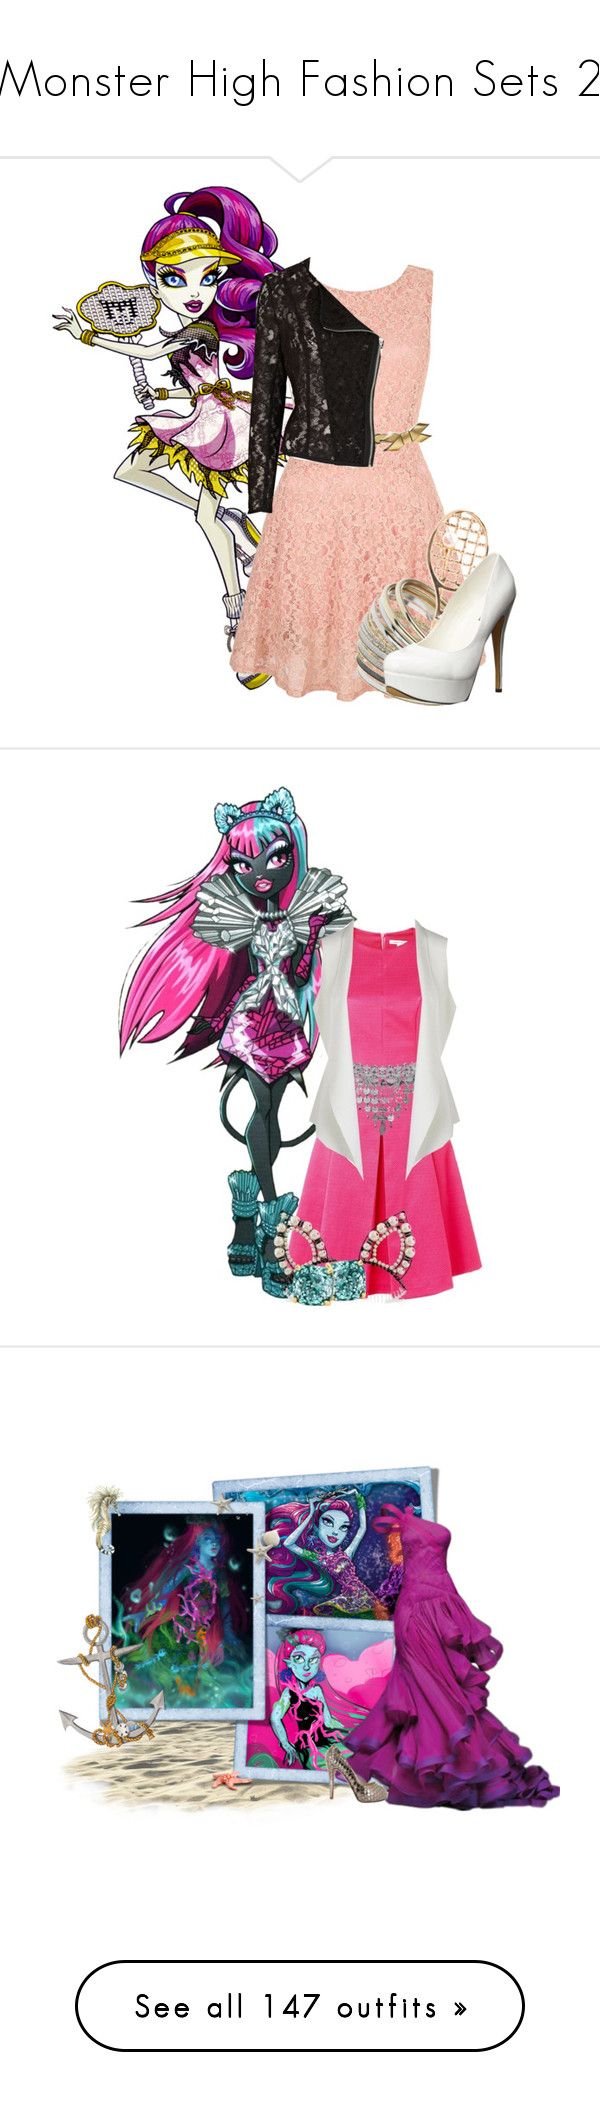 """Monster High Fashion Sets 2"" by bluetidegirl ❤ liked on Polyvore featuring Yumi, Miss Selfridge, Michael Antonio, Marni, River Island, Fenn Wright Manson, Erickson Beamon, Kate Spade, Eileen Fisher and Versace"